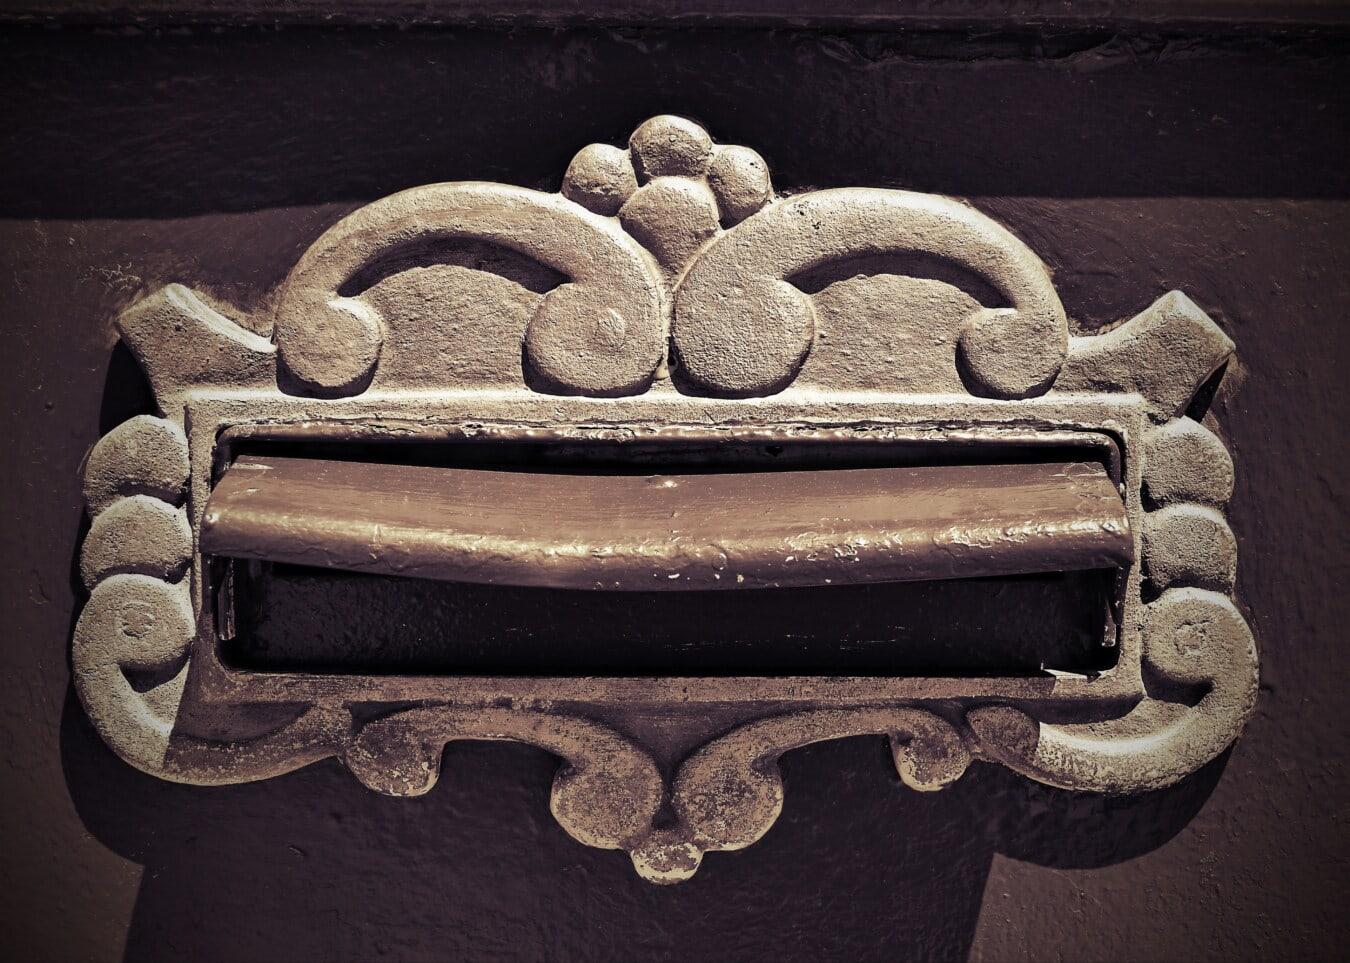 mail slot, close-up, mailbox, rust, vintage, brass, history, detail, ornament, monochrome